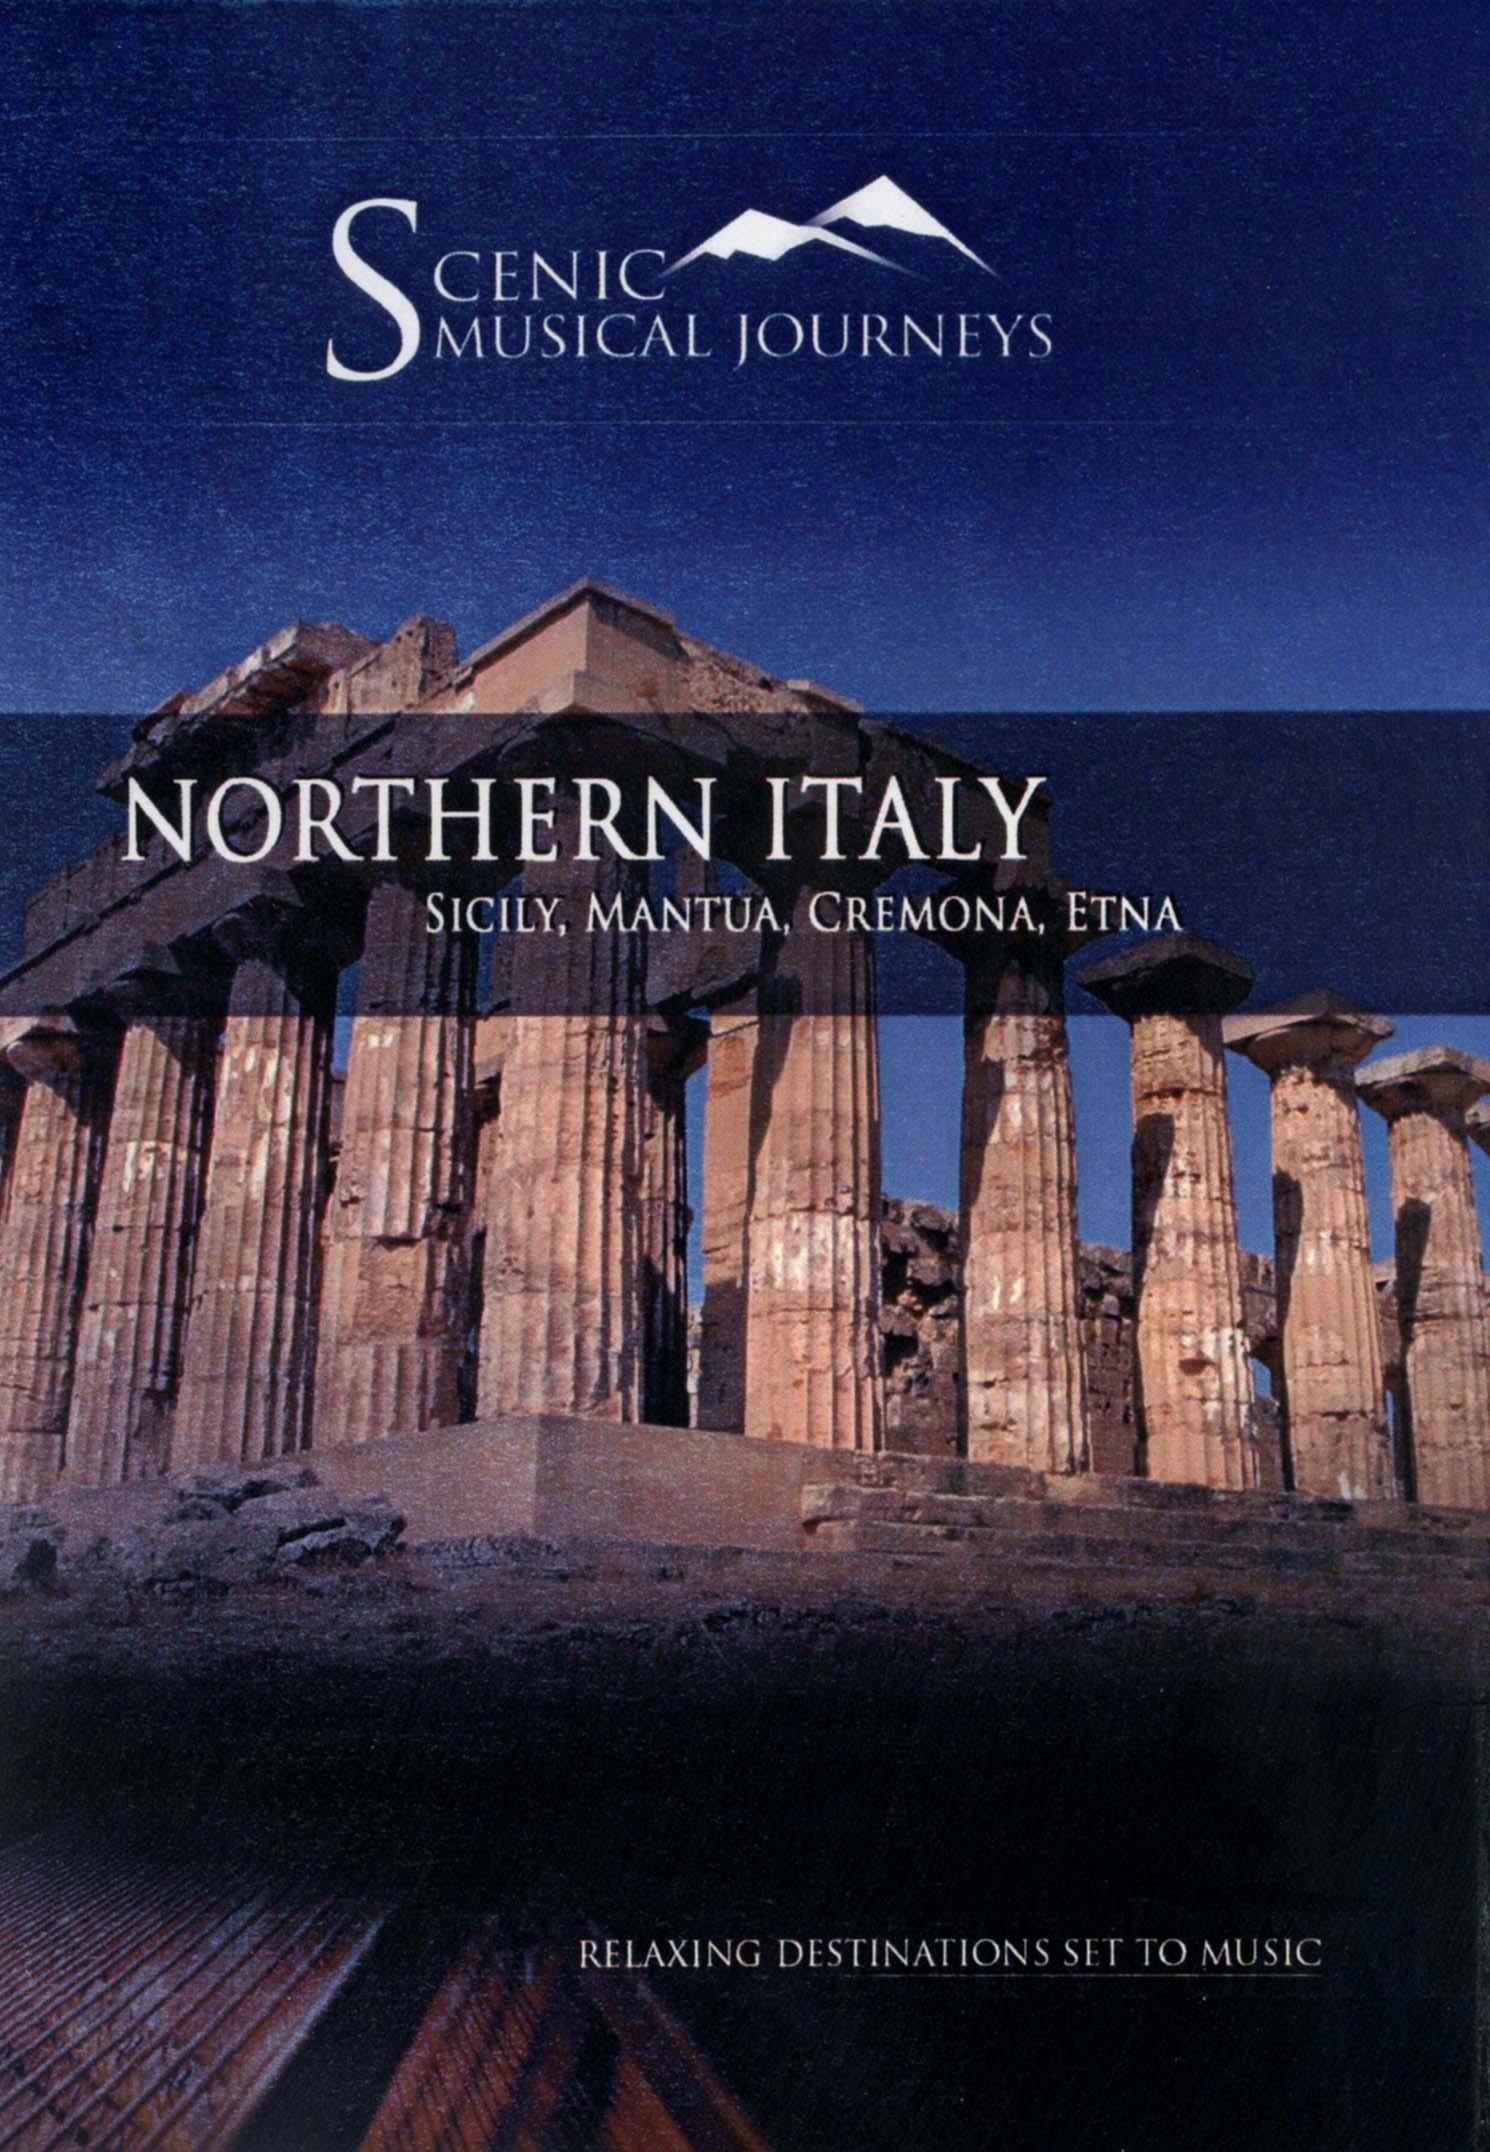 Scenic Musical Journeys: Northern Italy - Sicily, Mantua, Cremona, Etna